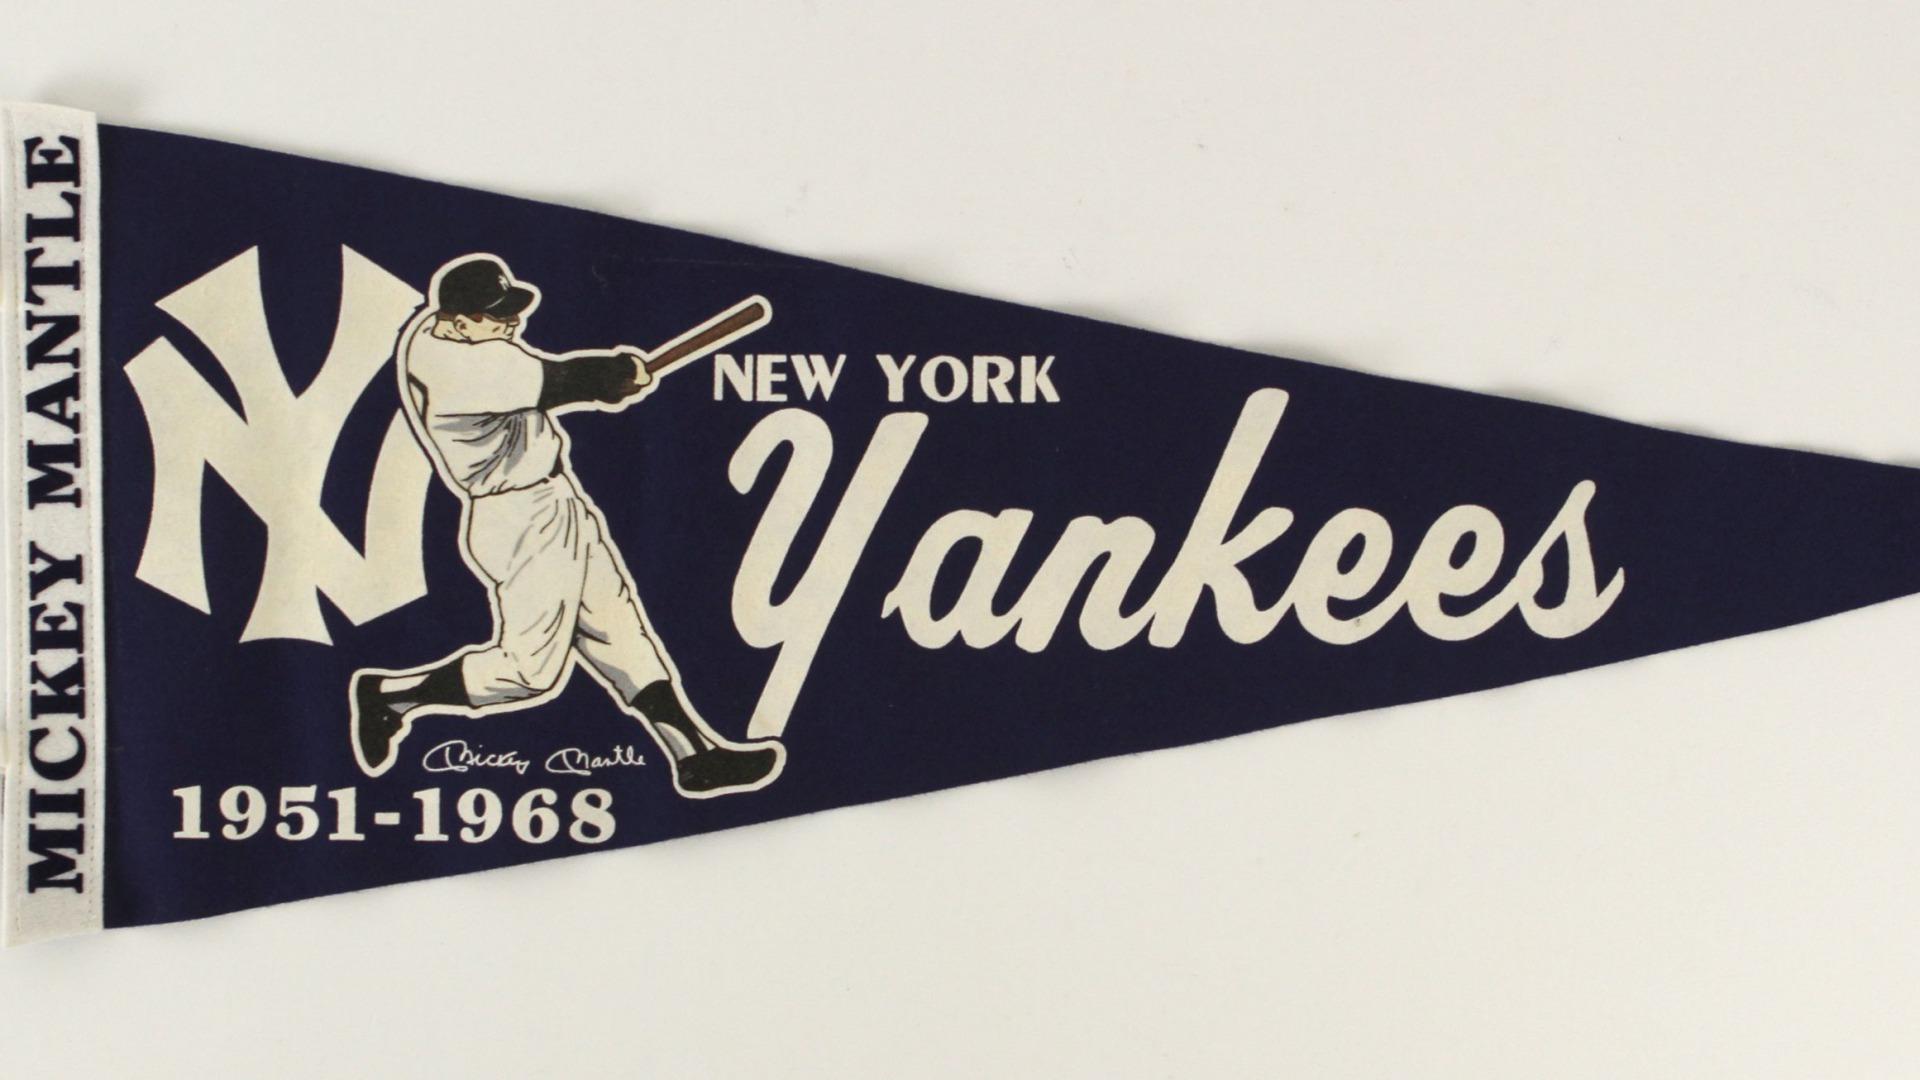 New York Yankees Wallpaper - Label , HD Wallpaper & Backgrounds